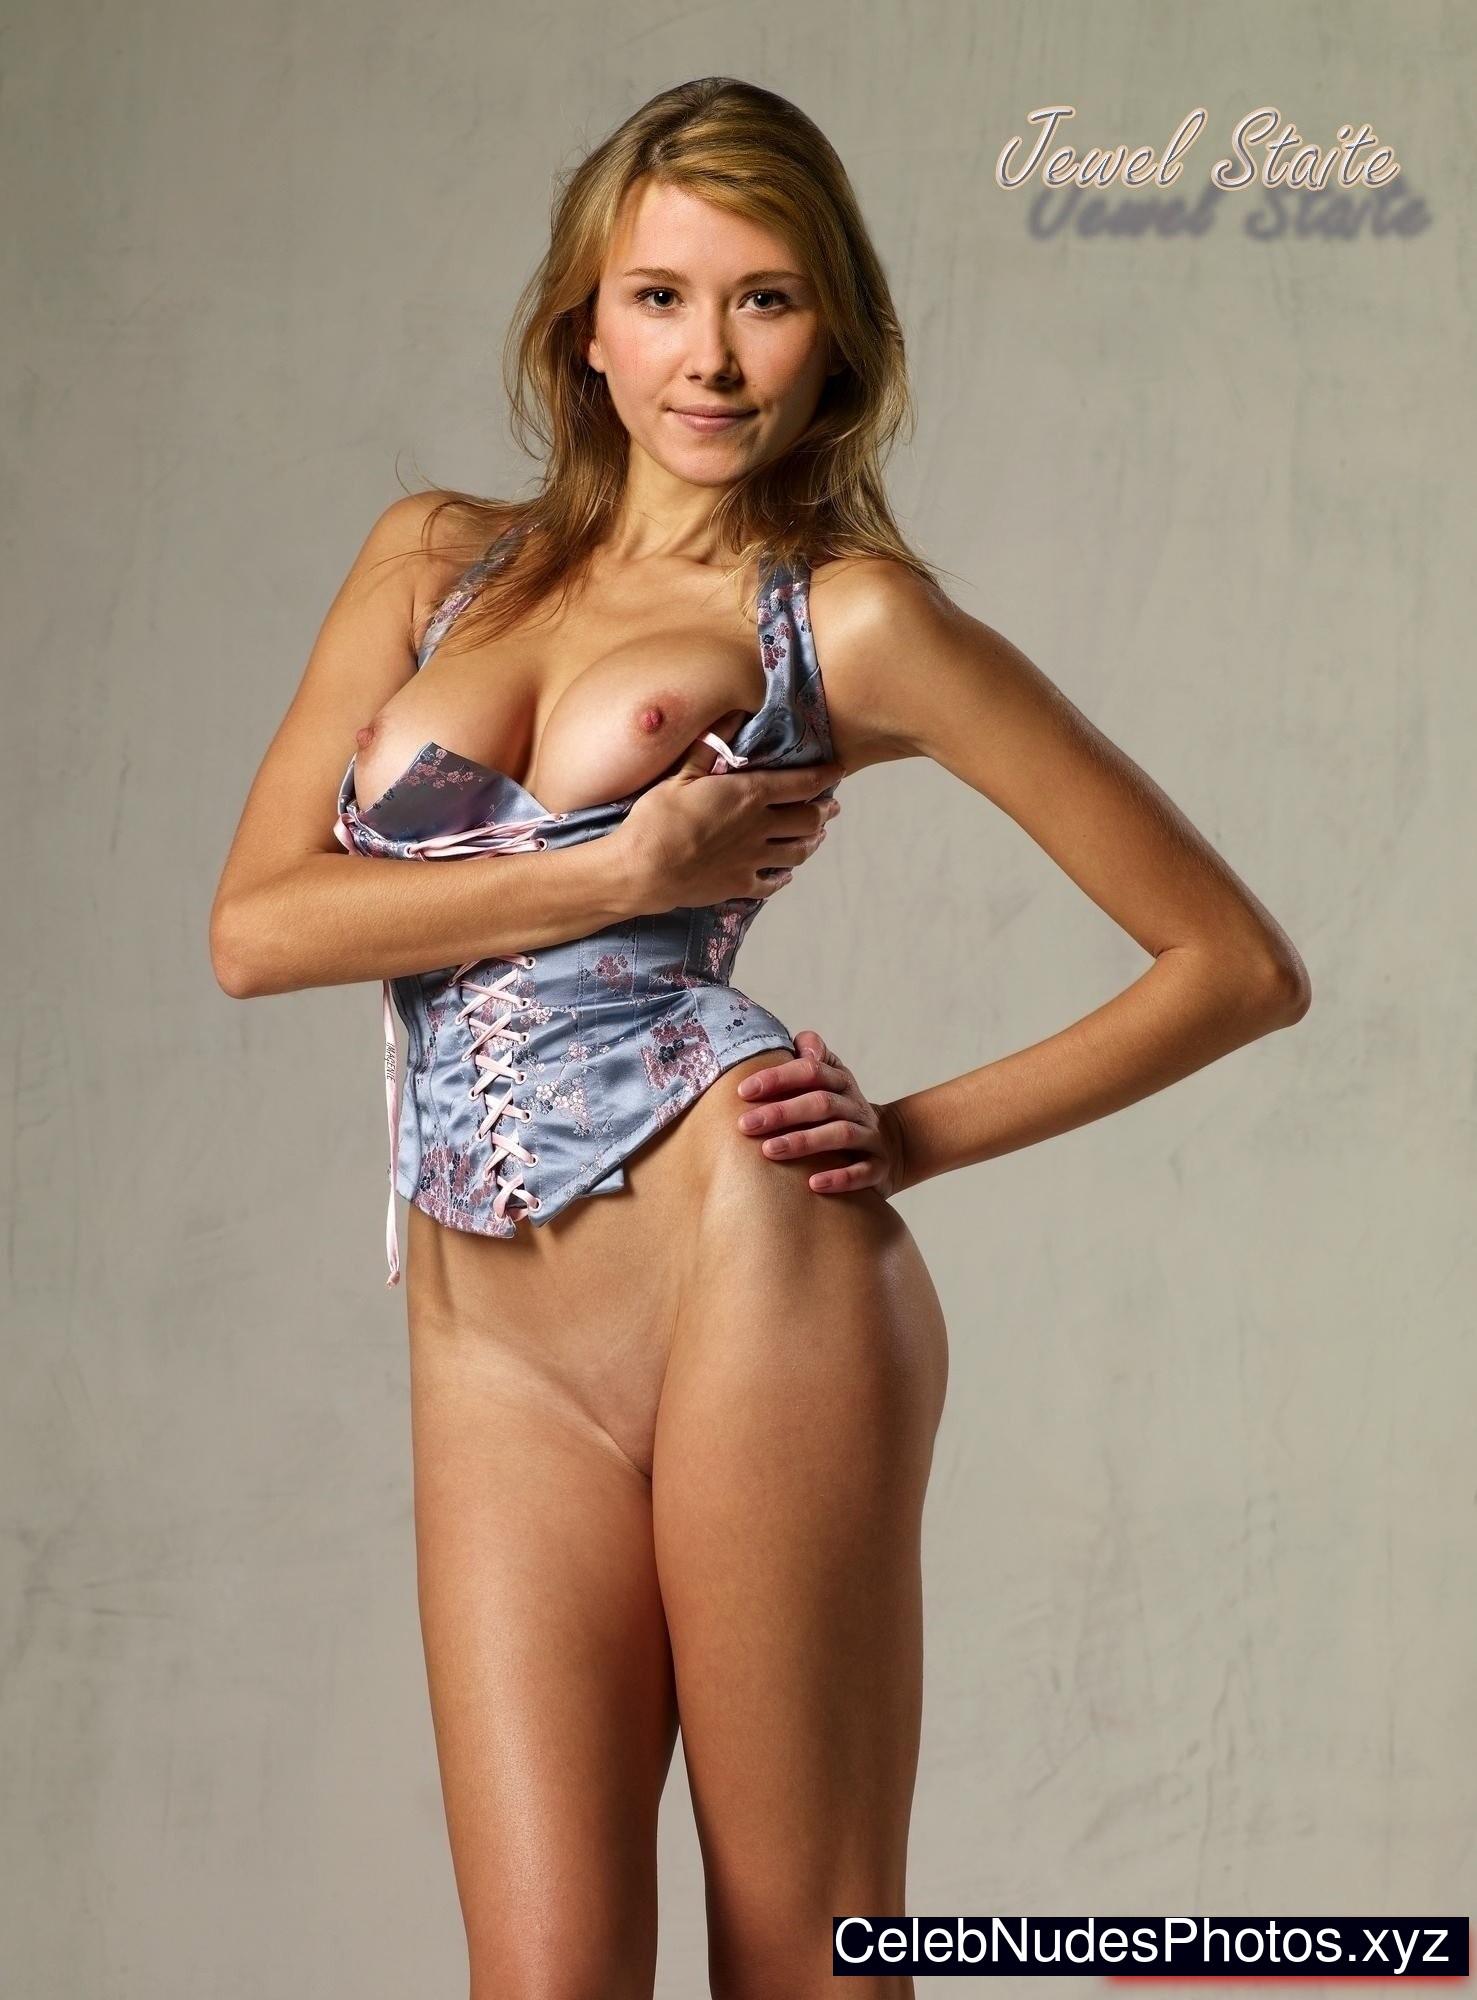 Jewel Staite nude celebrities